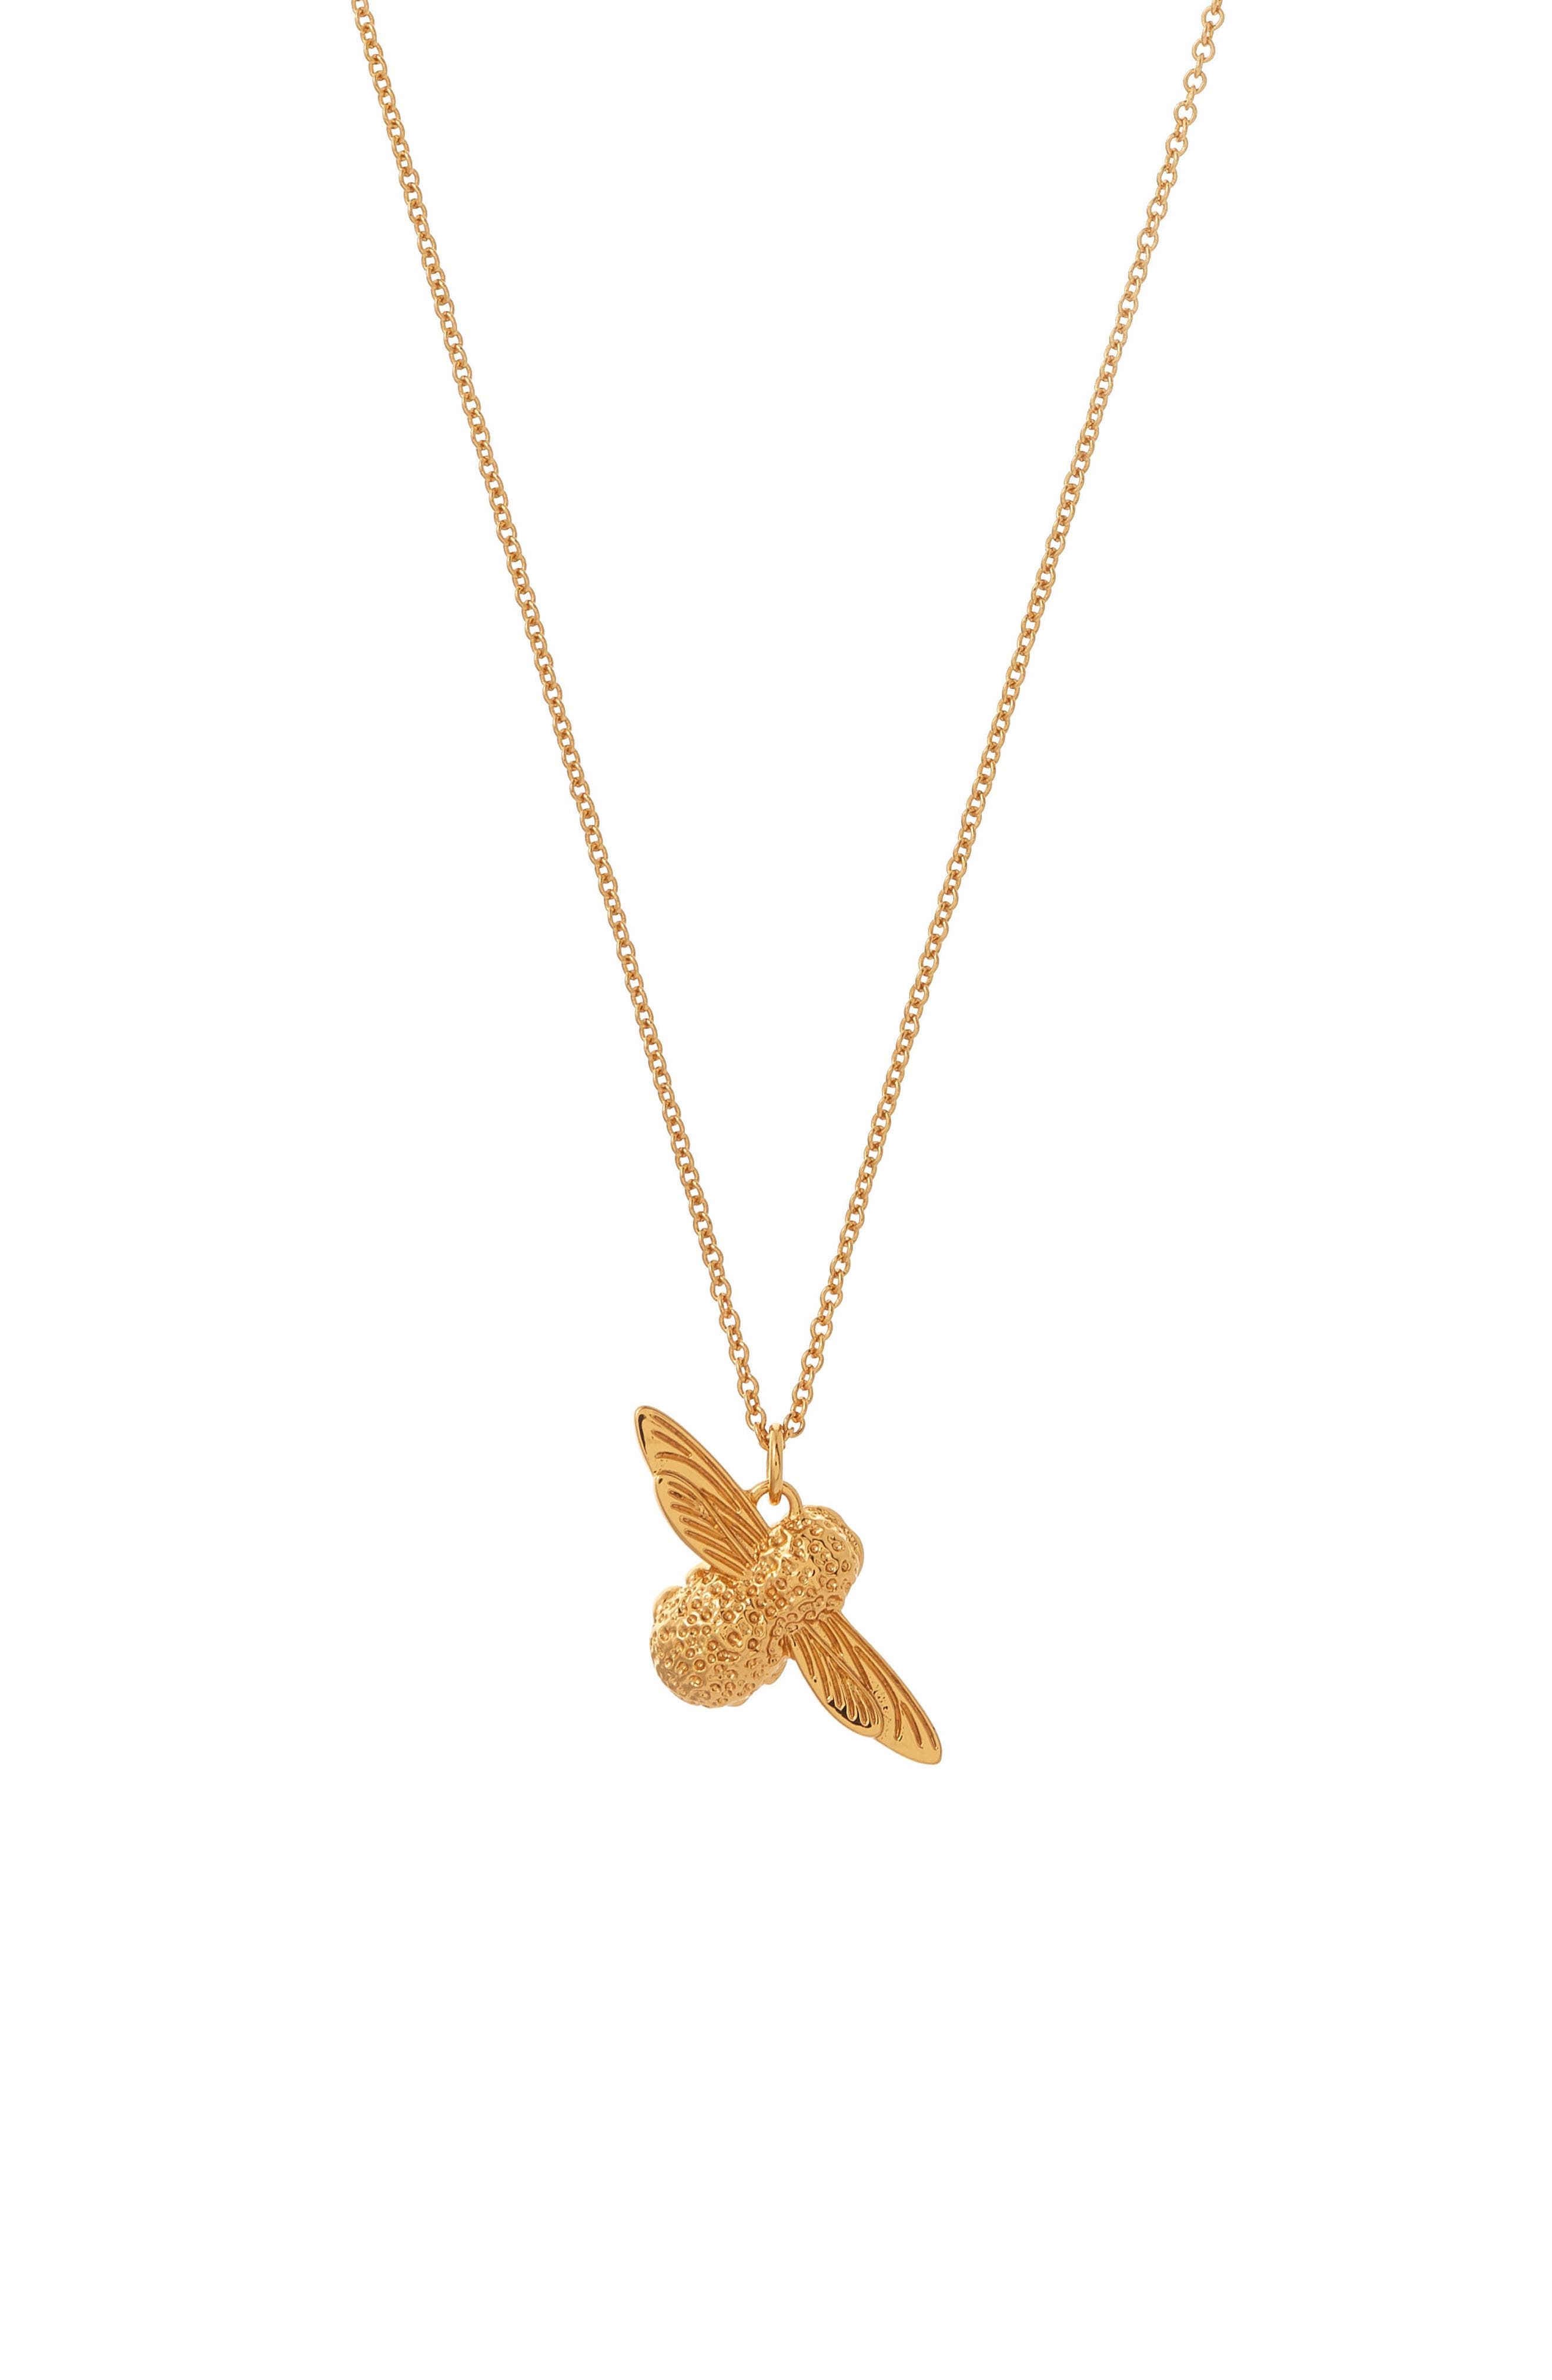 3D Bee Pendant Necklace,                         Main,                         color, Gold